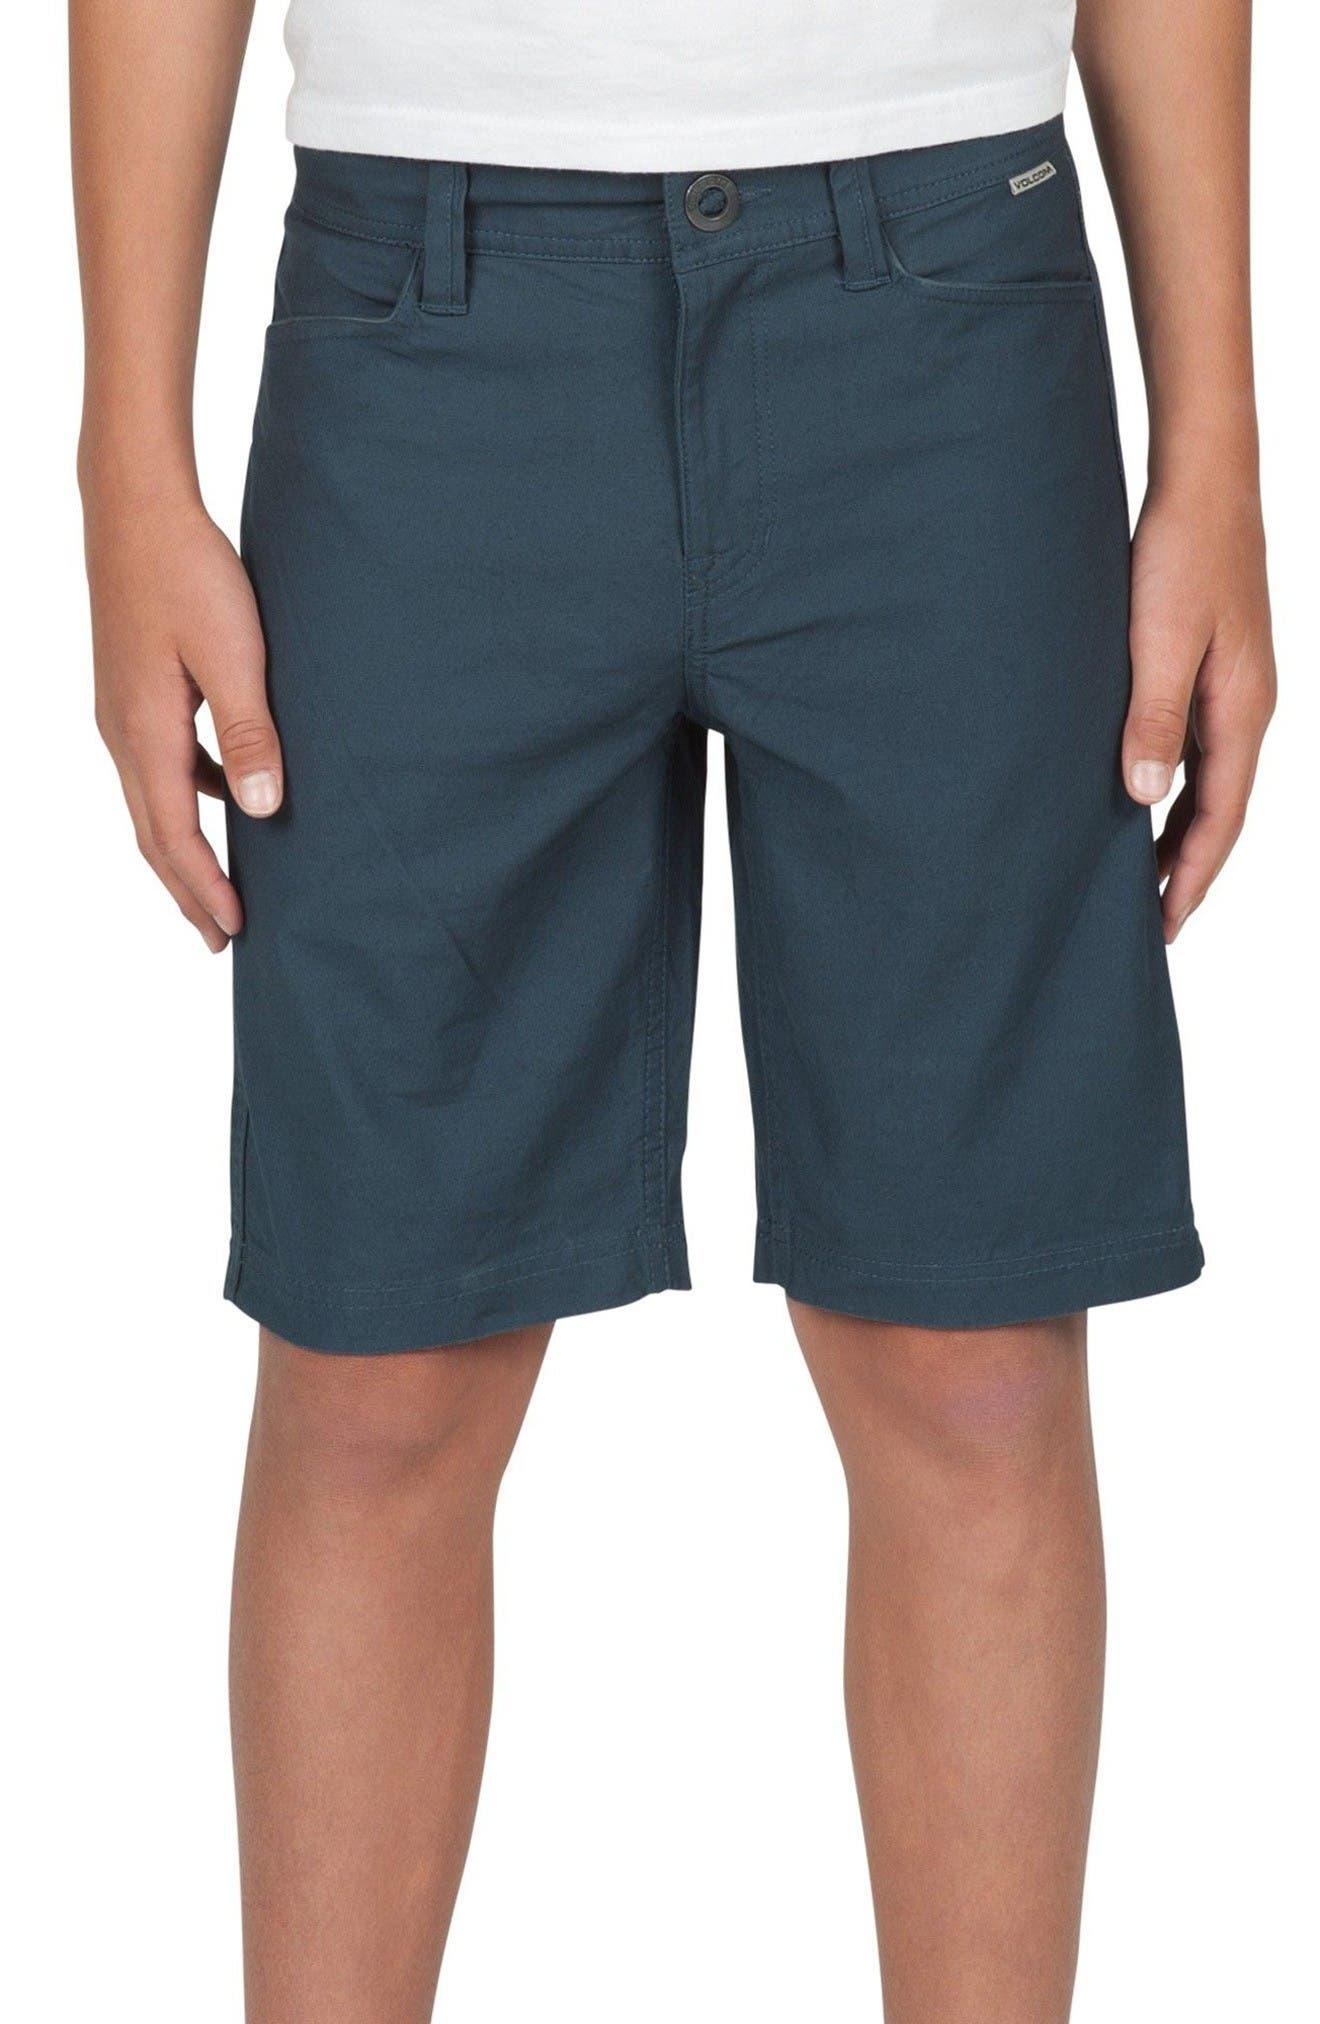 Alternate Image 1 Selected - Volcom VSM Gritter Chino Shorts (Big Boys)